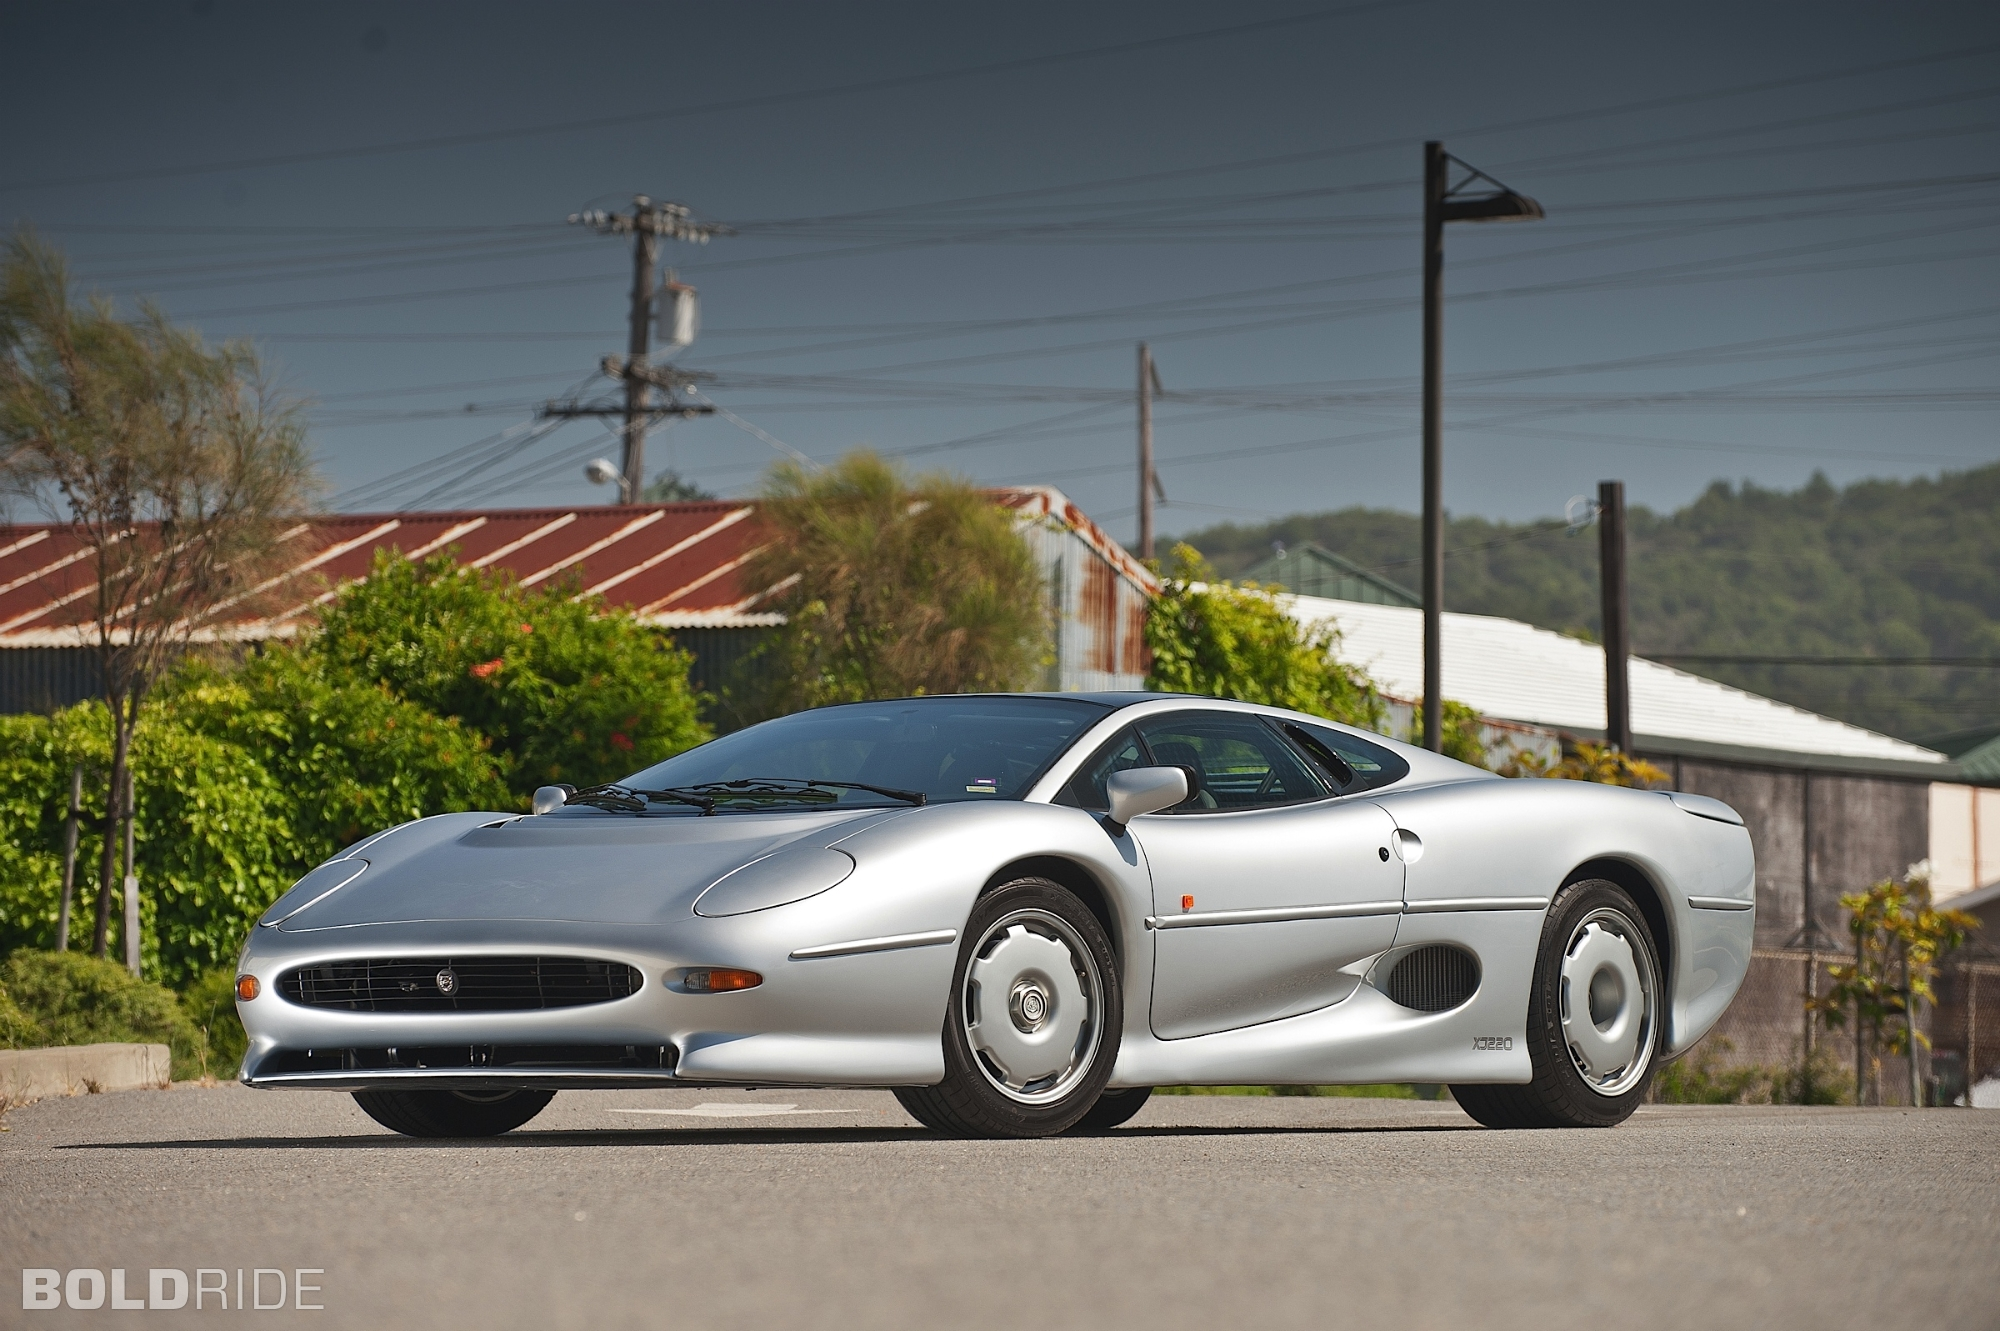 1993 Jaguar JX220